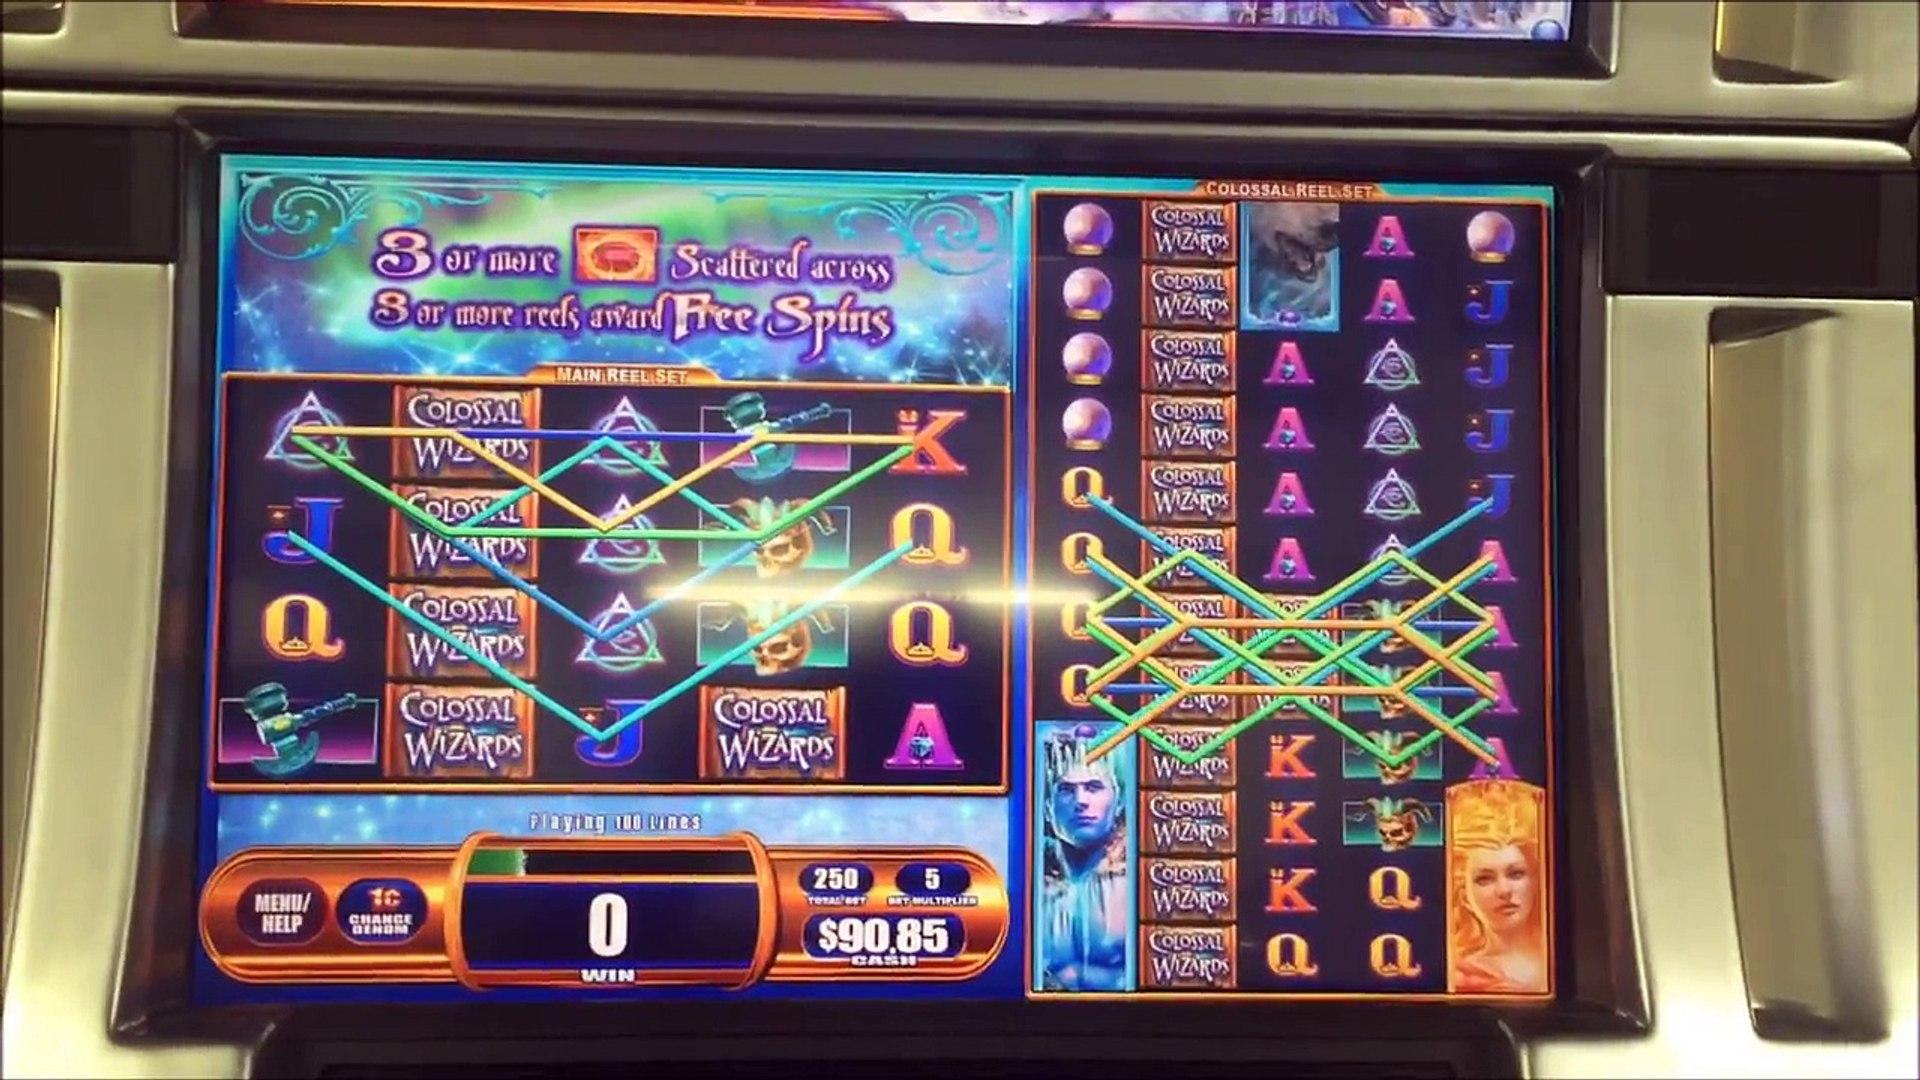 WMS xD™ Colossal Wizards™ Mega Bonus Win Slots